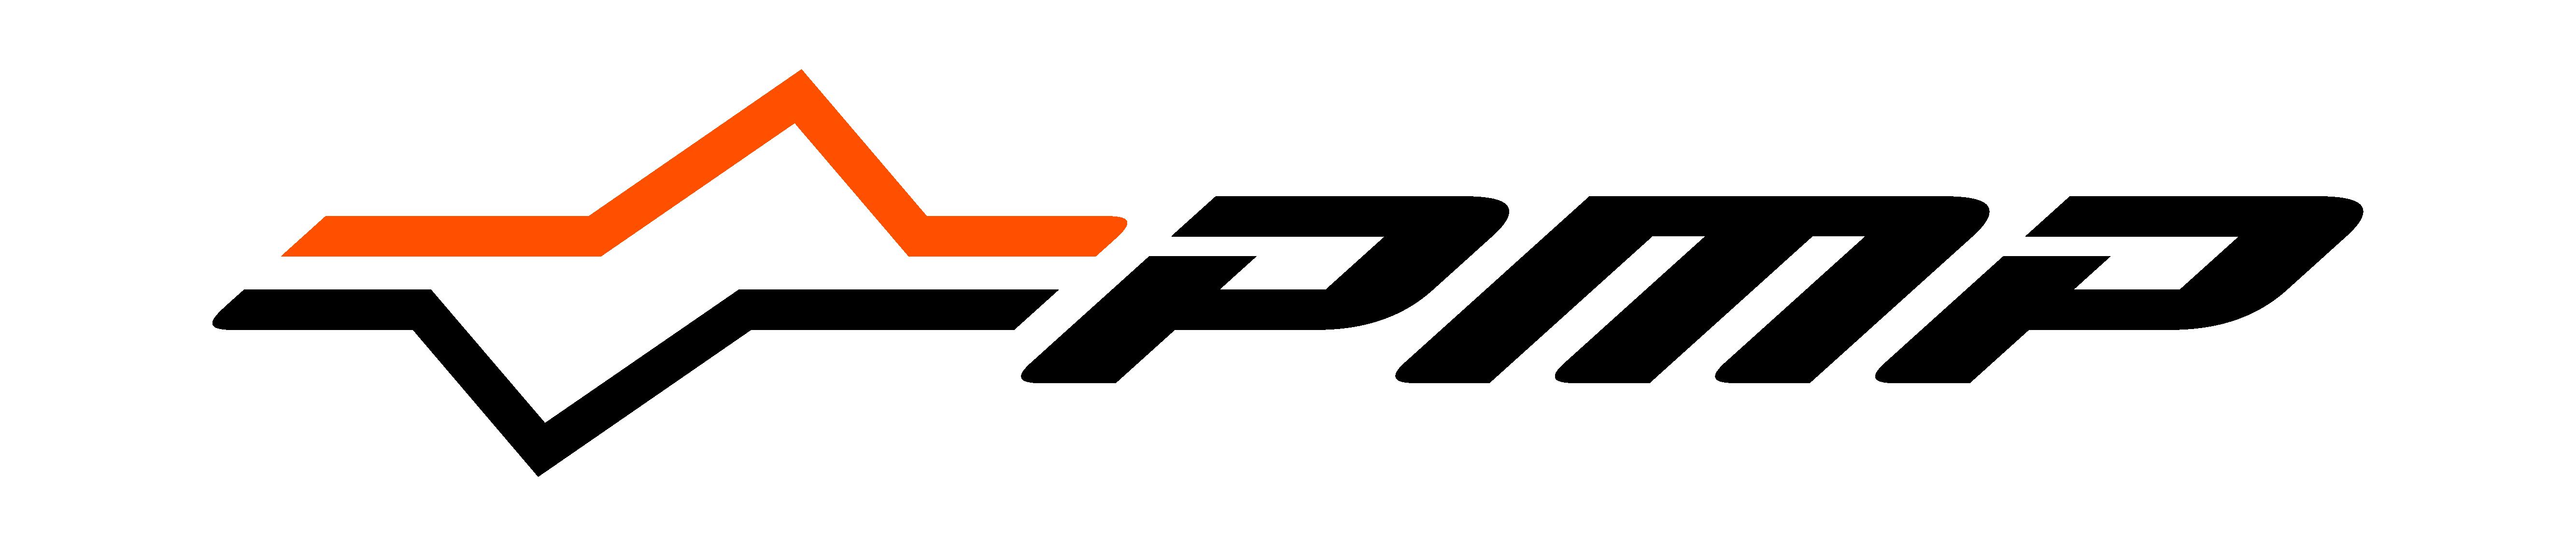 pmp+simbolo_a-n2